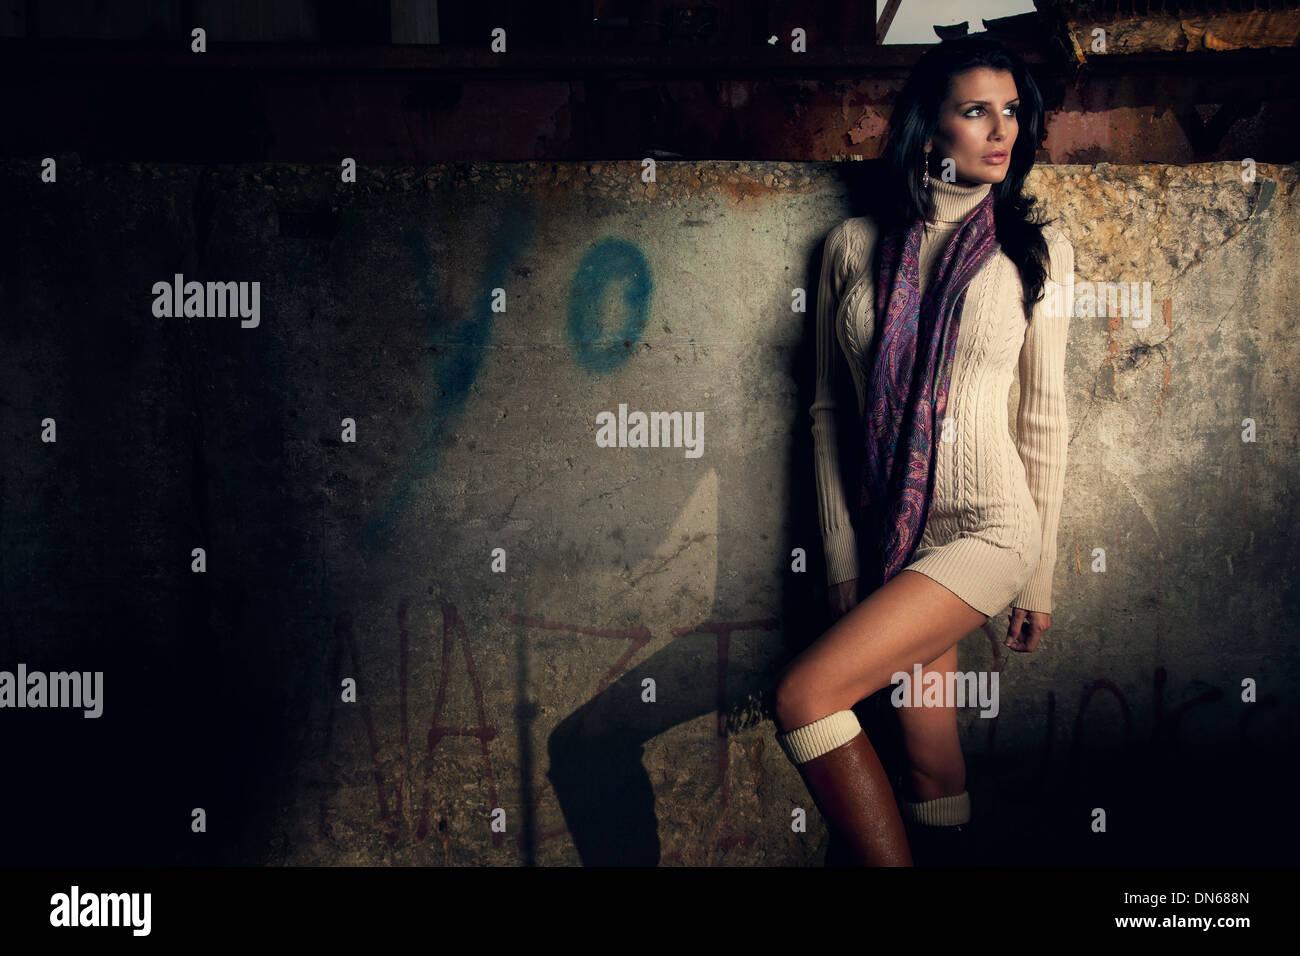 Mode-Porträt der Frau im verlassenen Lagerhaus in kurzen Kleid Stockbild